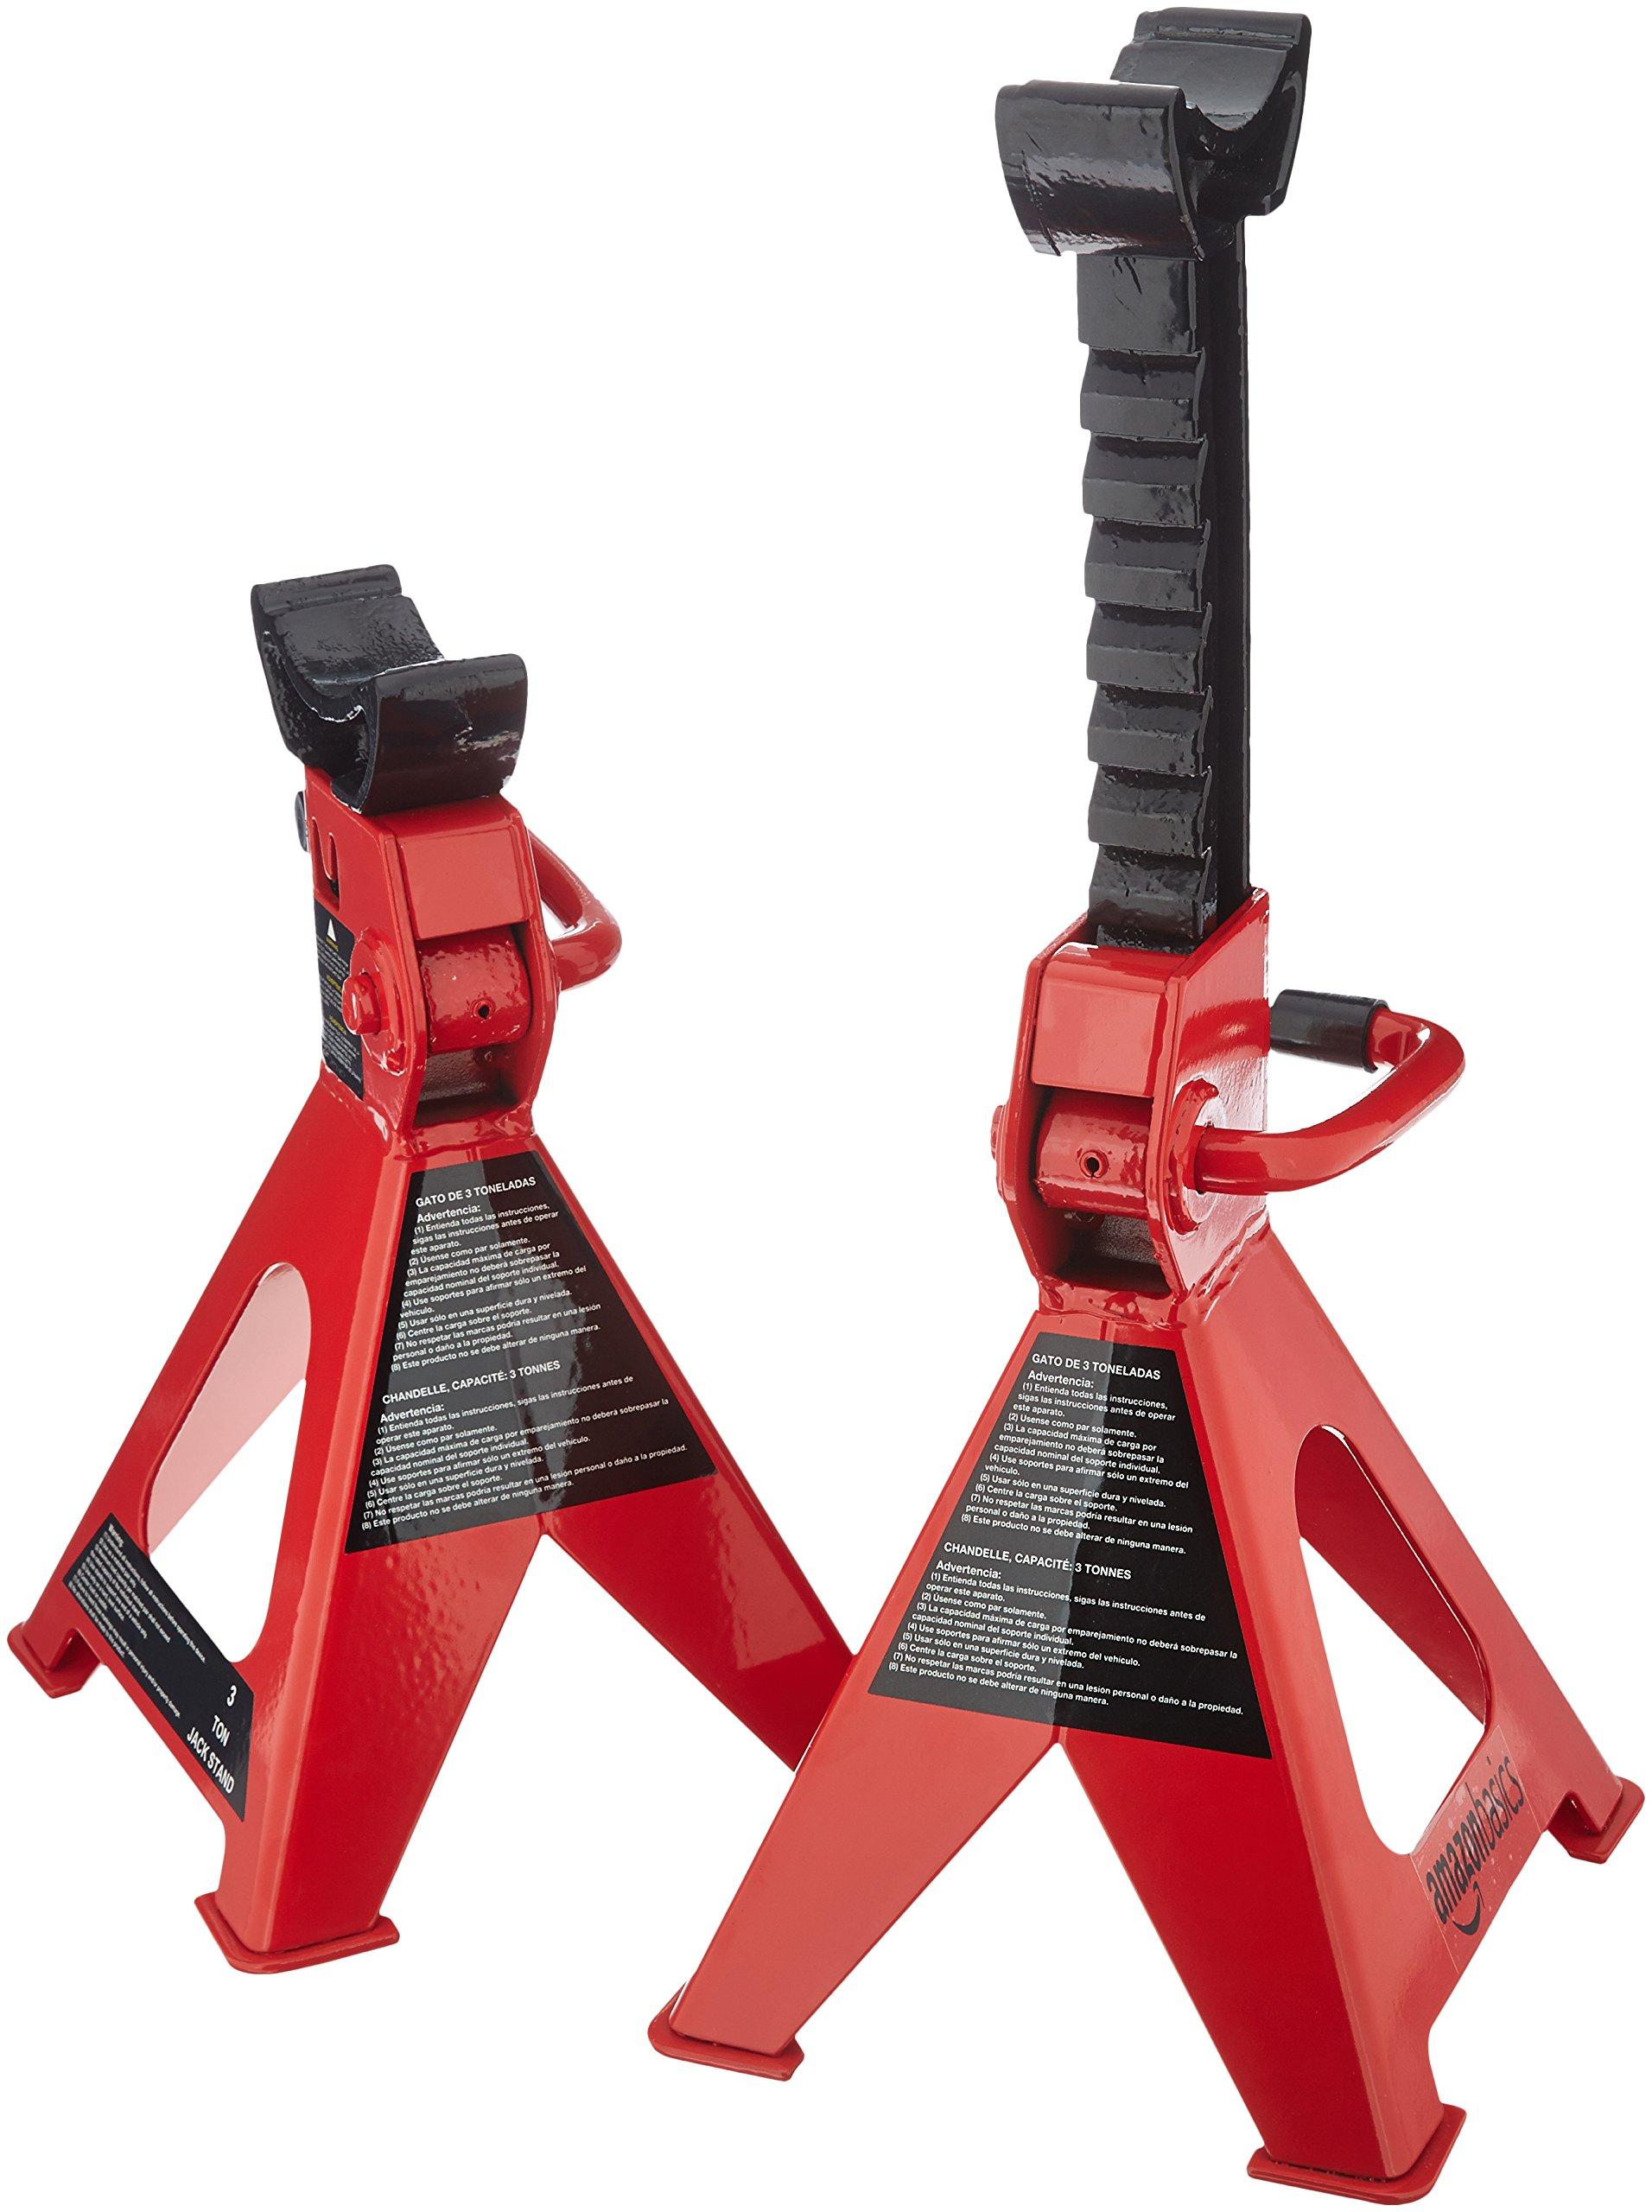 AmazonBasics Steel Jack Stands Capacity